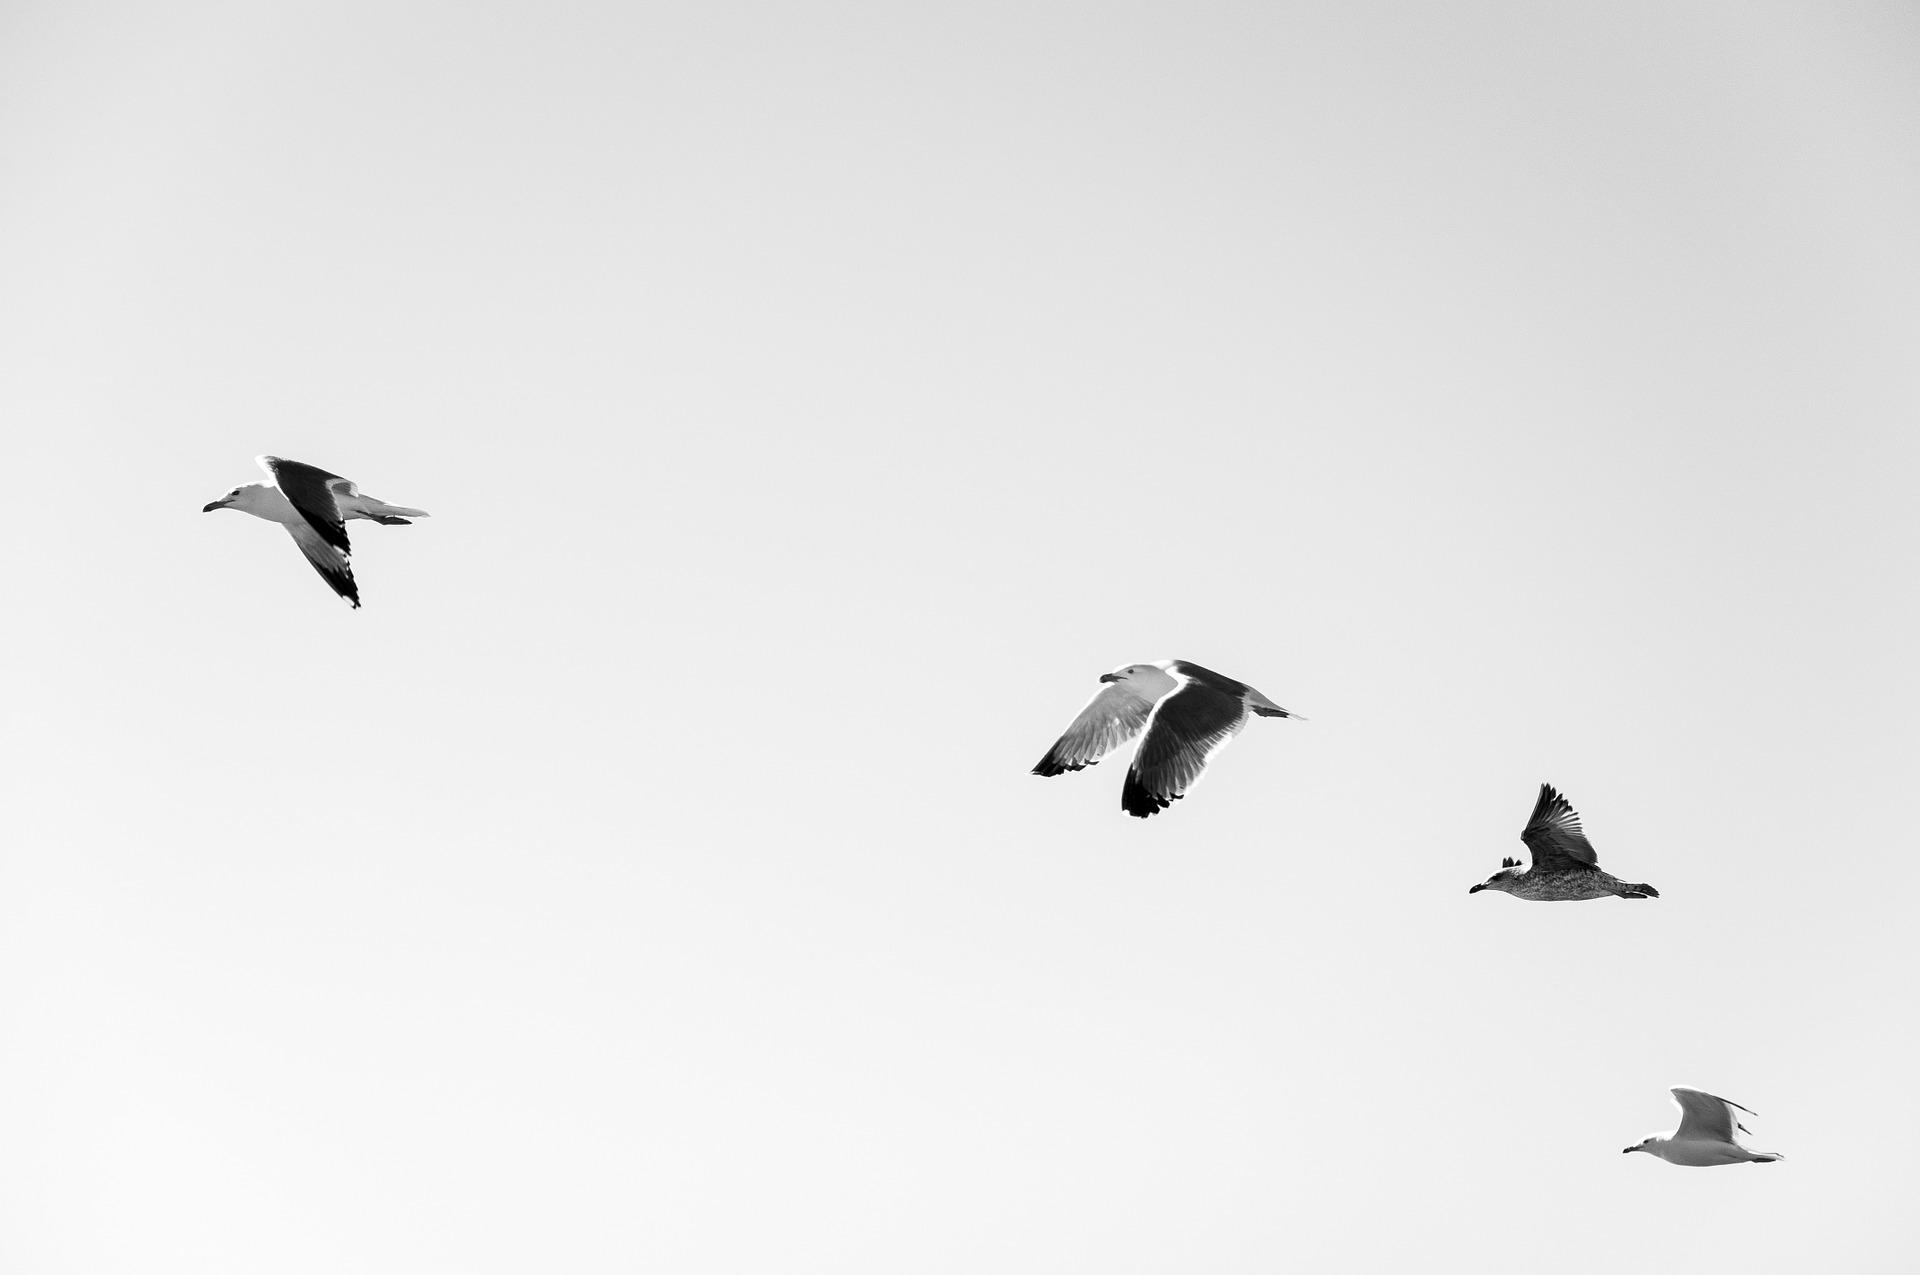 seagulls-984529_1920